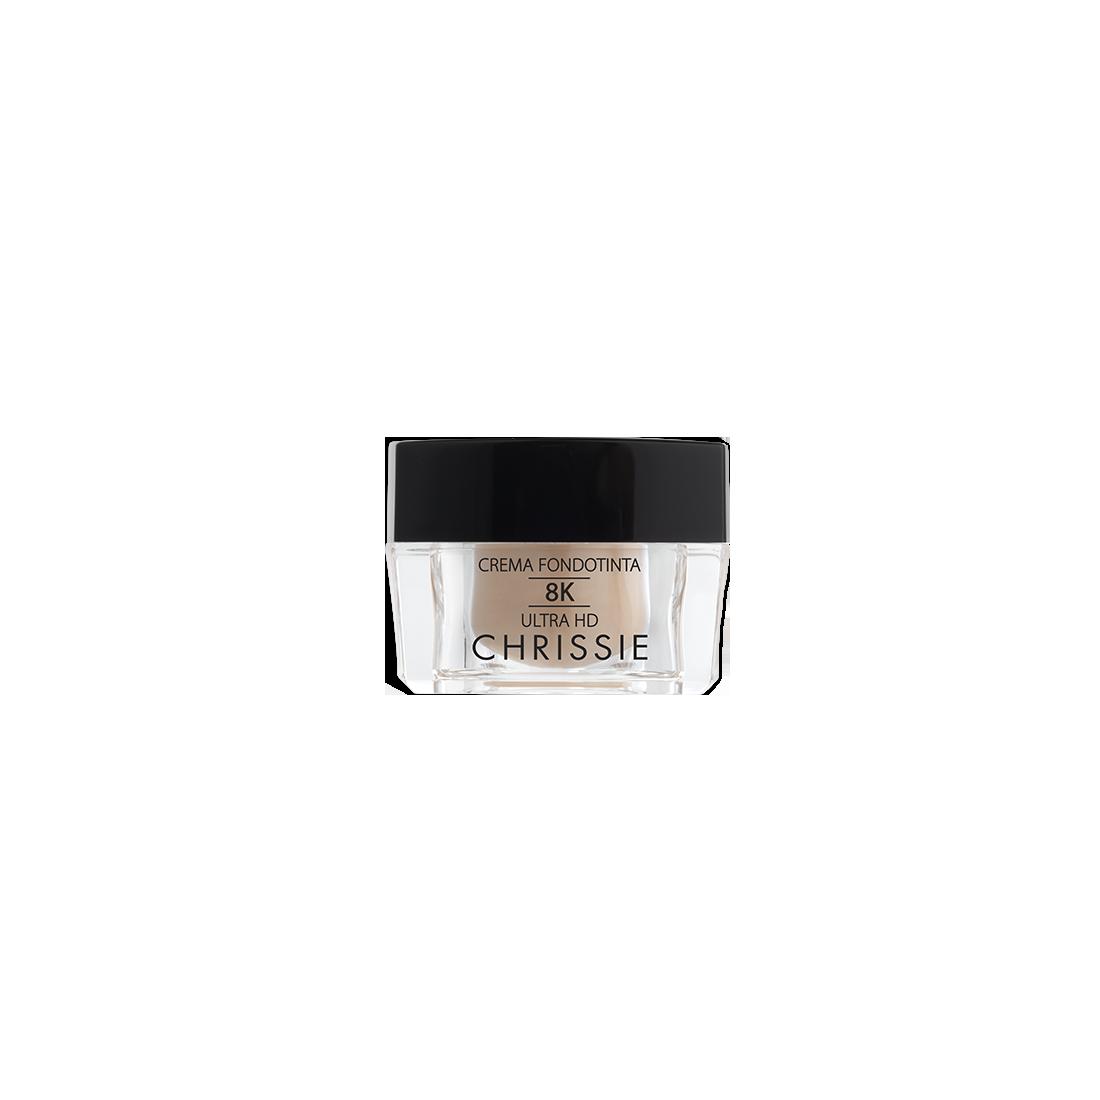 Crema Fondotinta 8K Ultra HD SPF 15